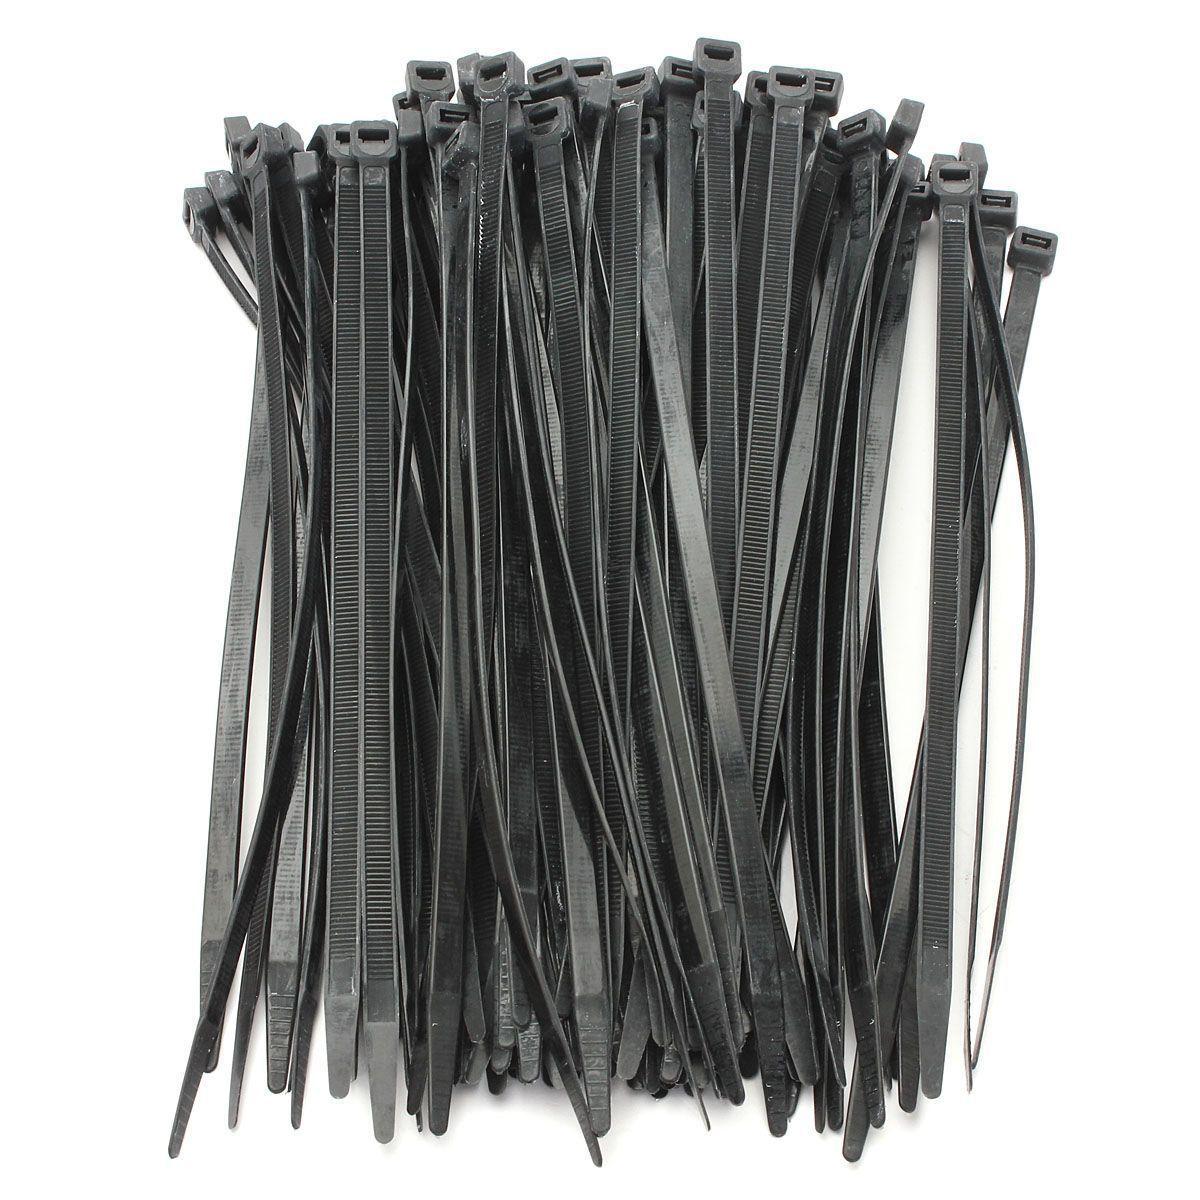 2ecb3dcea779 Ksol 100PCS Strong Cable Ties / Tie Wraps Zip Ties Color:Black  Size:5*300mm/5*200/5*370/7.2*250/4.8*450/4.8*350/4.8*300/4.8*250